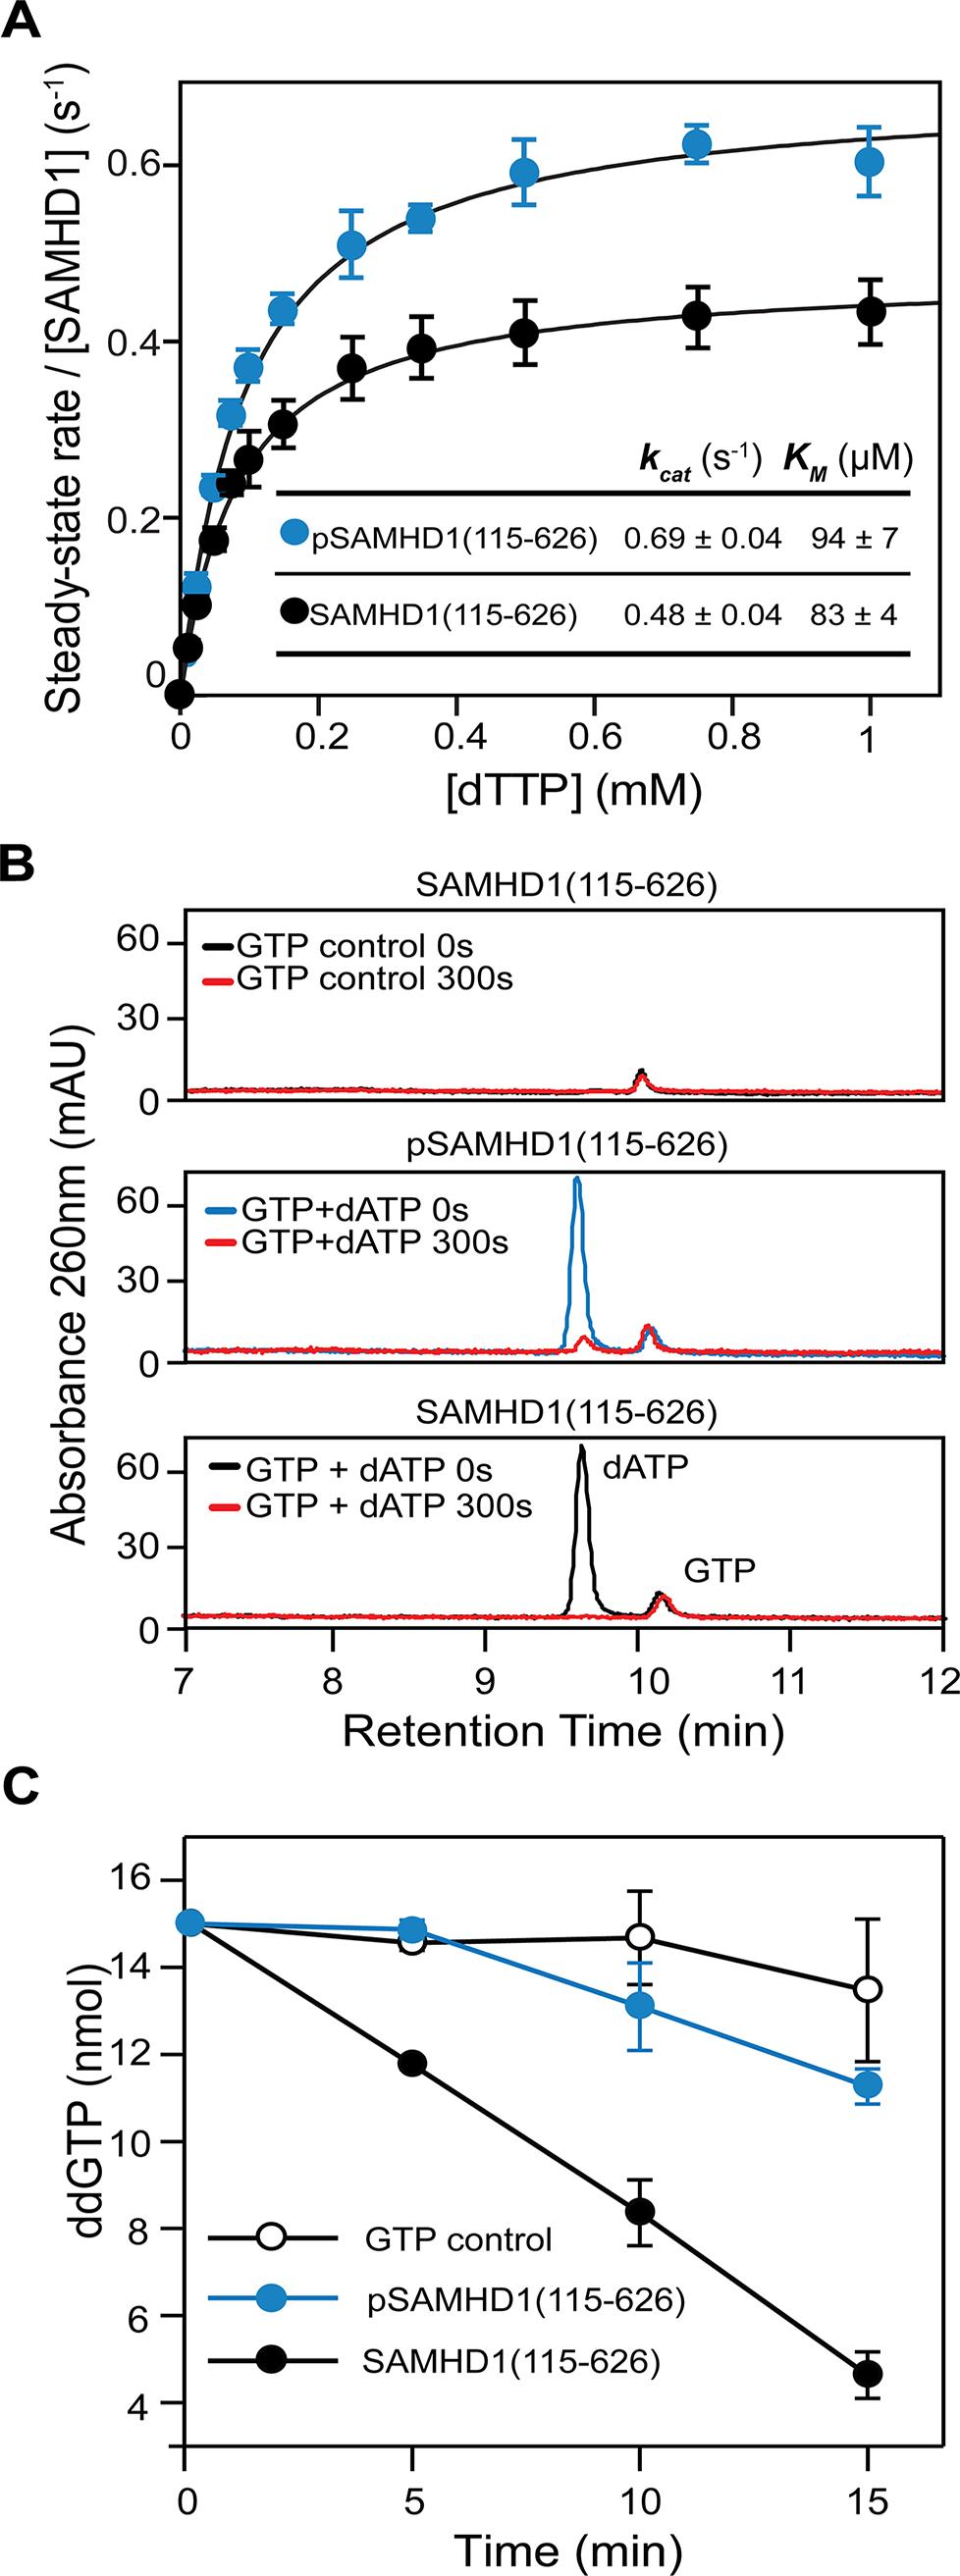 The effect of phosphorylation on SAMHD1 enzyme activity.